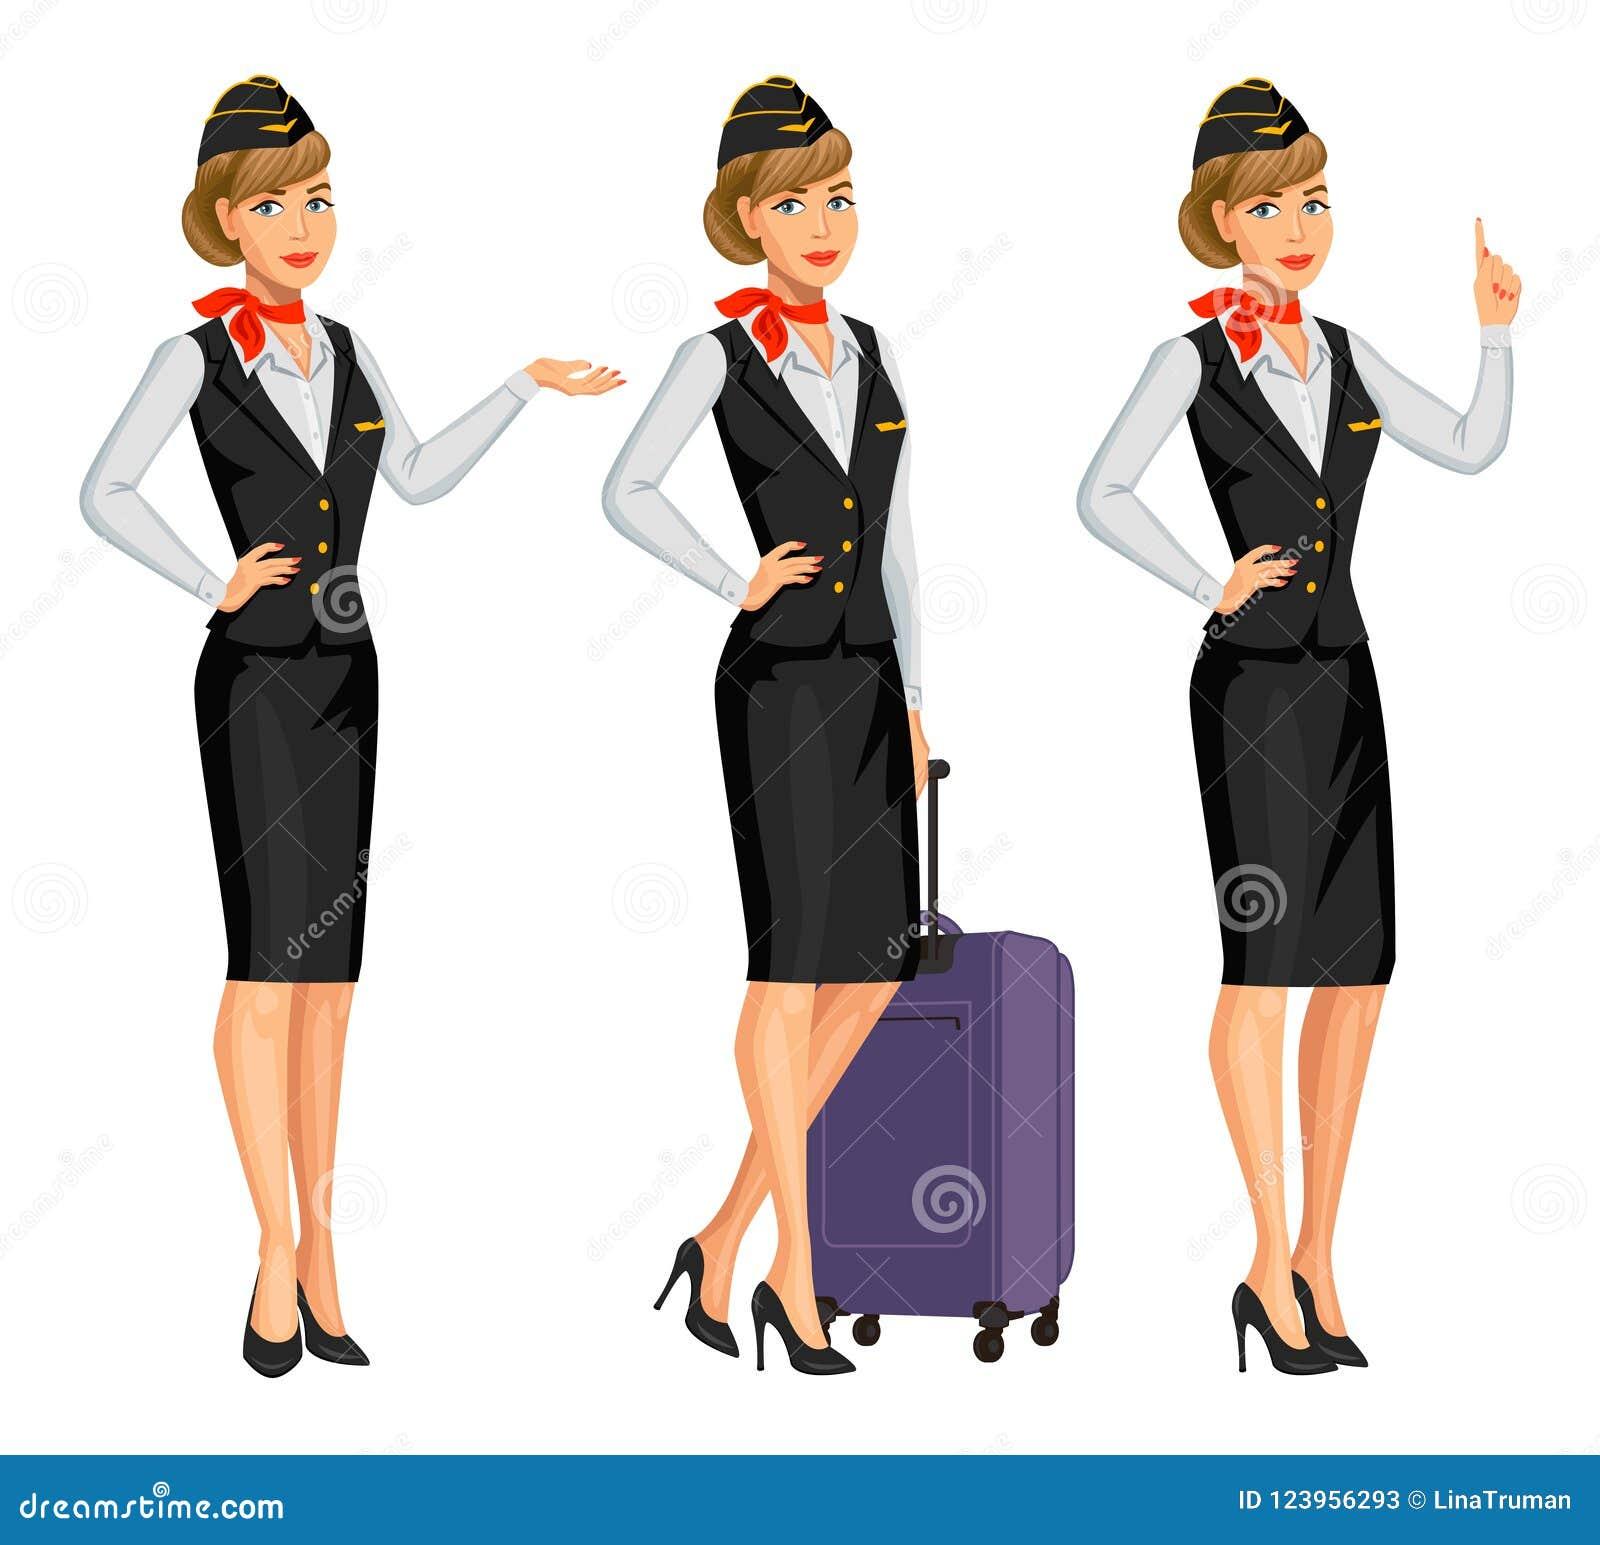 e1dbbe136d9ec Royalty-Free Vector. Stewardess in black uniform. Flying attendants